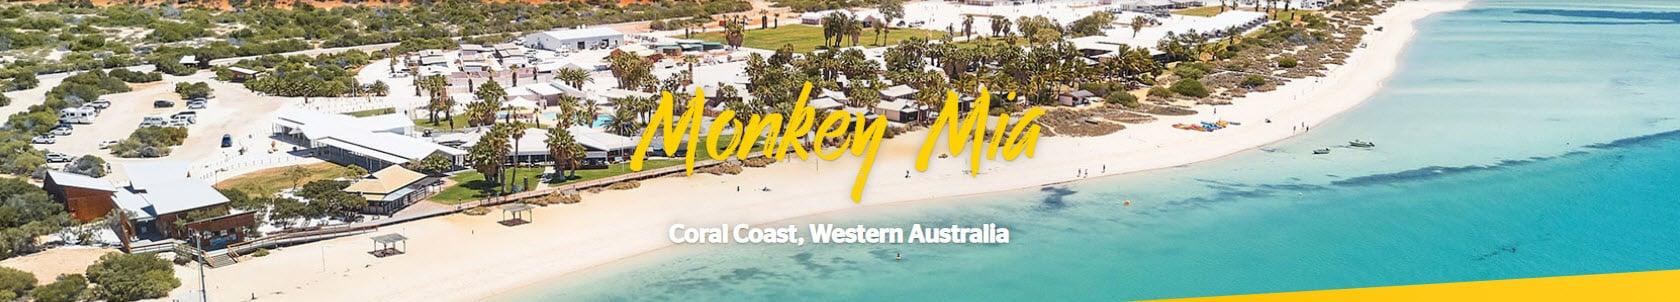 Monkey Mia Dolphin Resort - Monkey mia dolphin resort